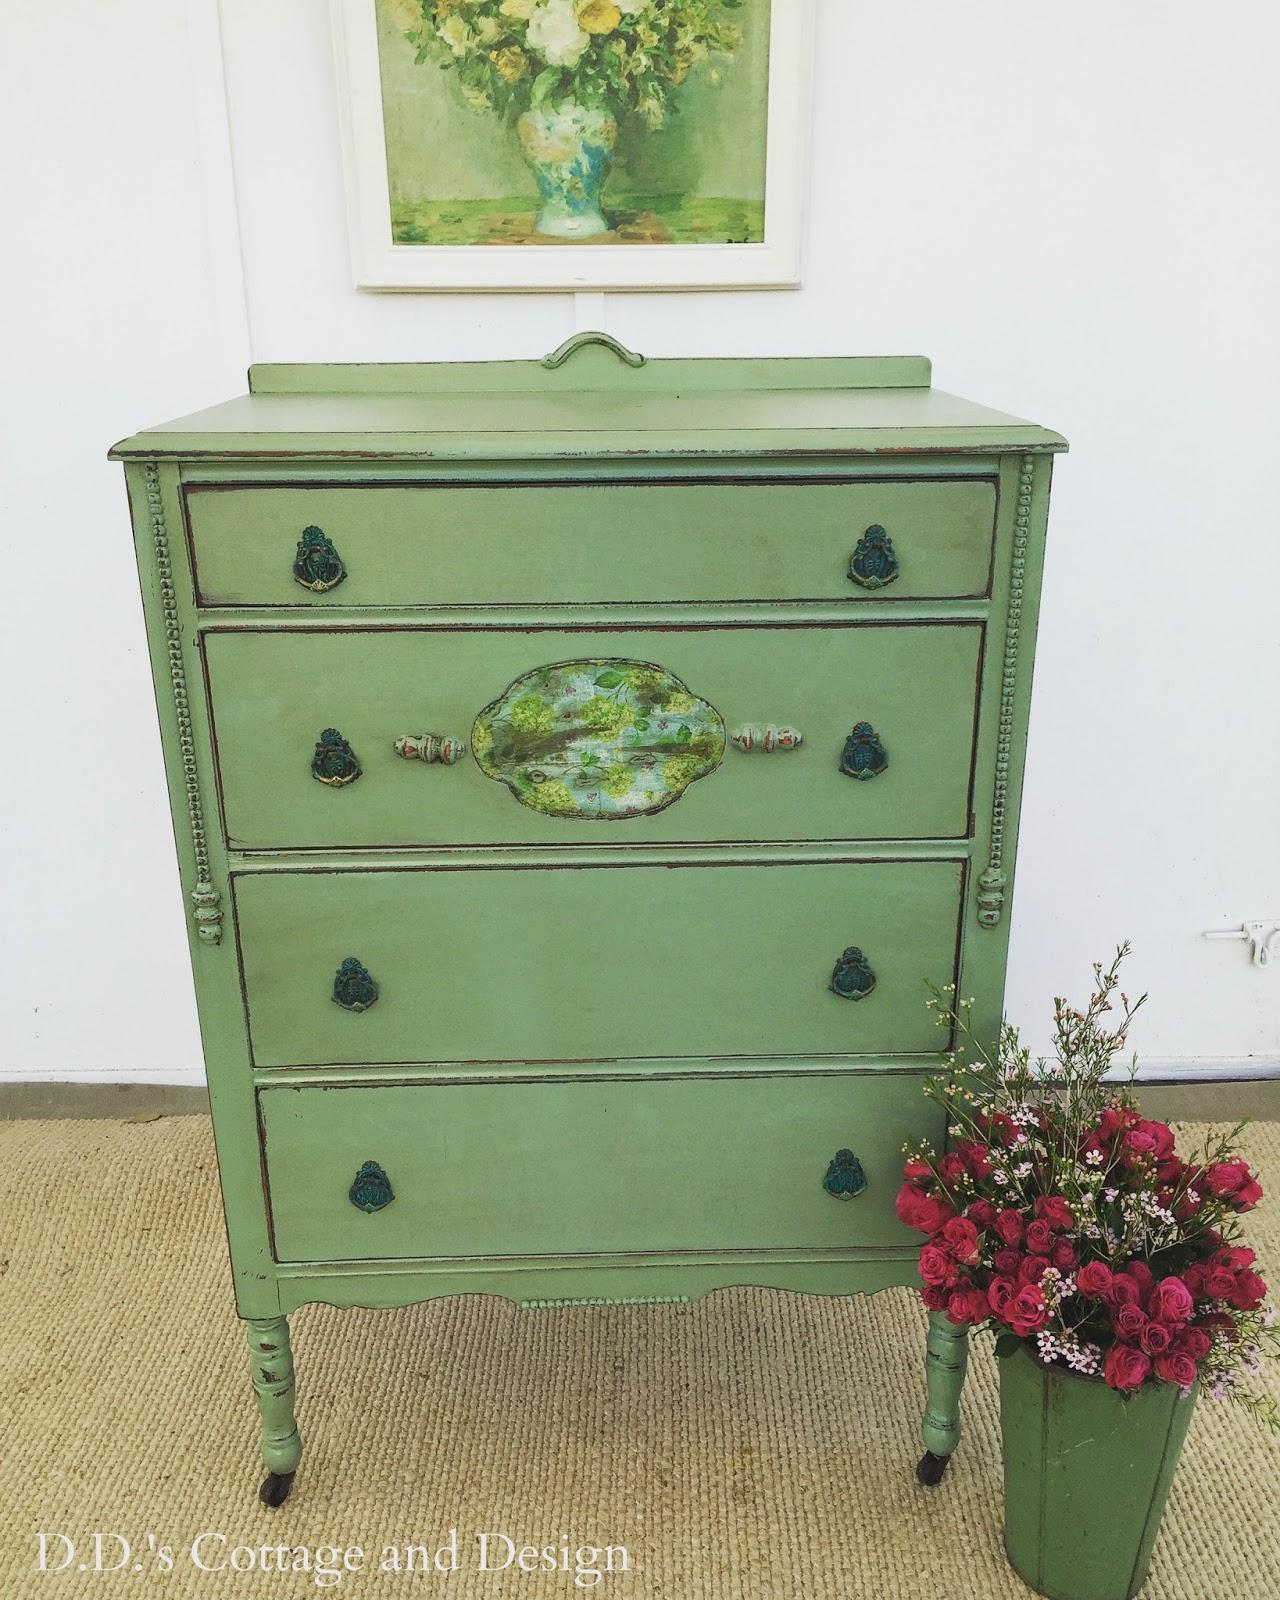 A Vintage Green Dresser and a Napkin - D.D.'s Cottage And Design: A Vintage Green Dresser And A Napkin